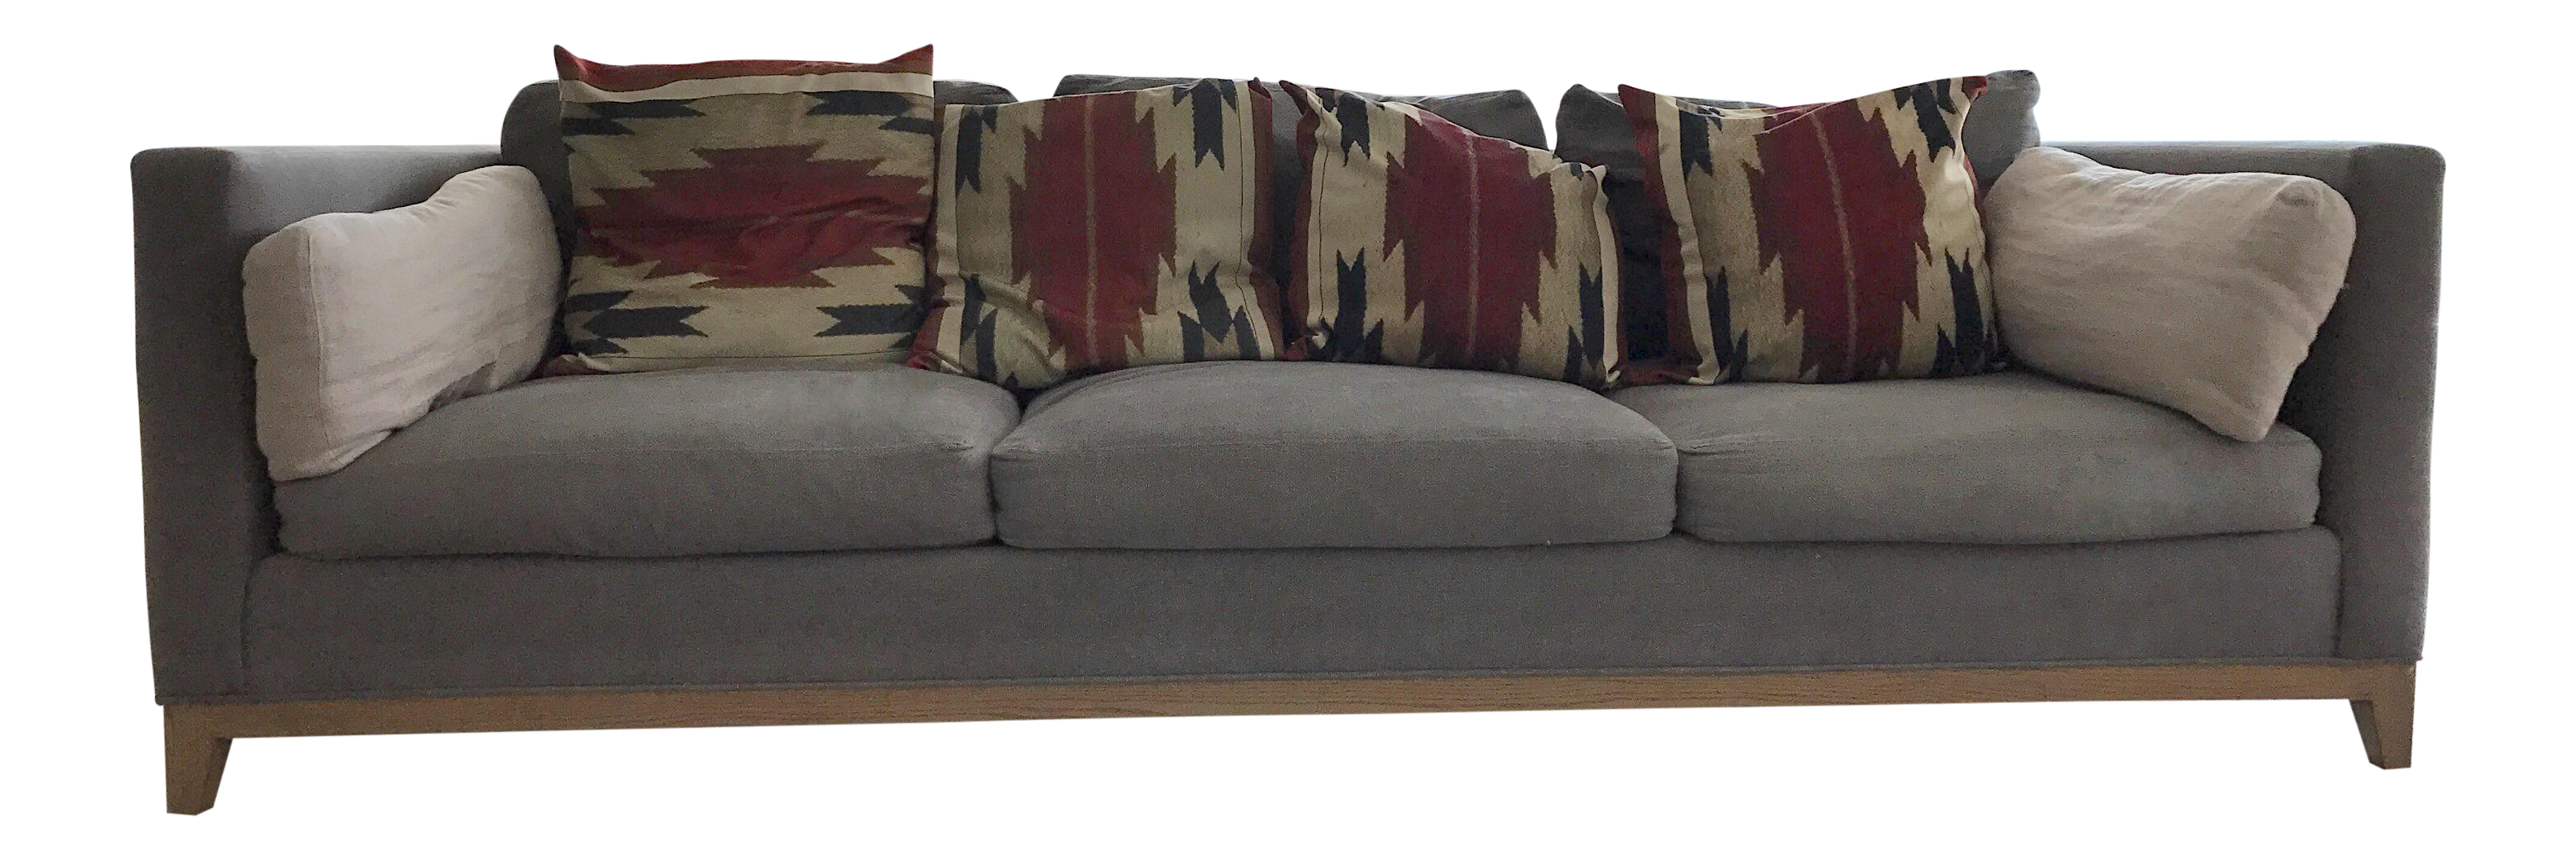 Crate Barrel Taraval Oak Based Sofa Chairish